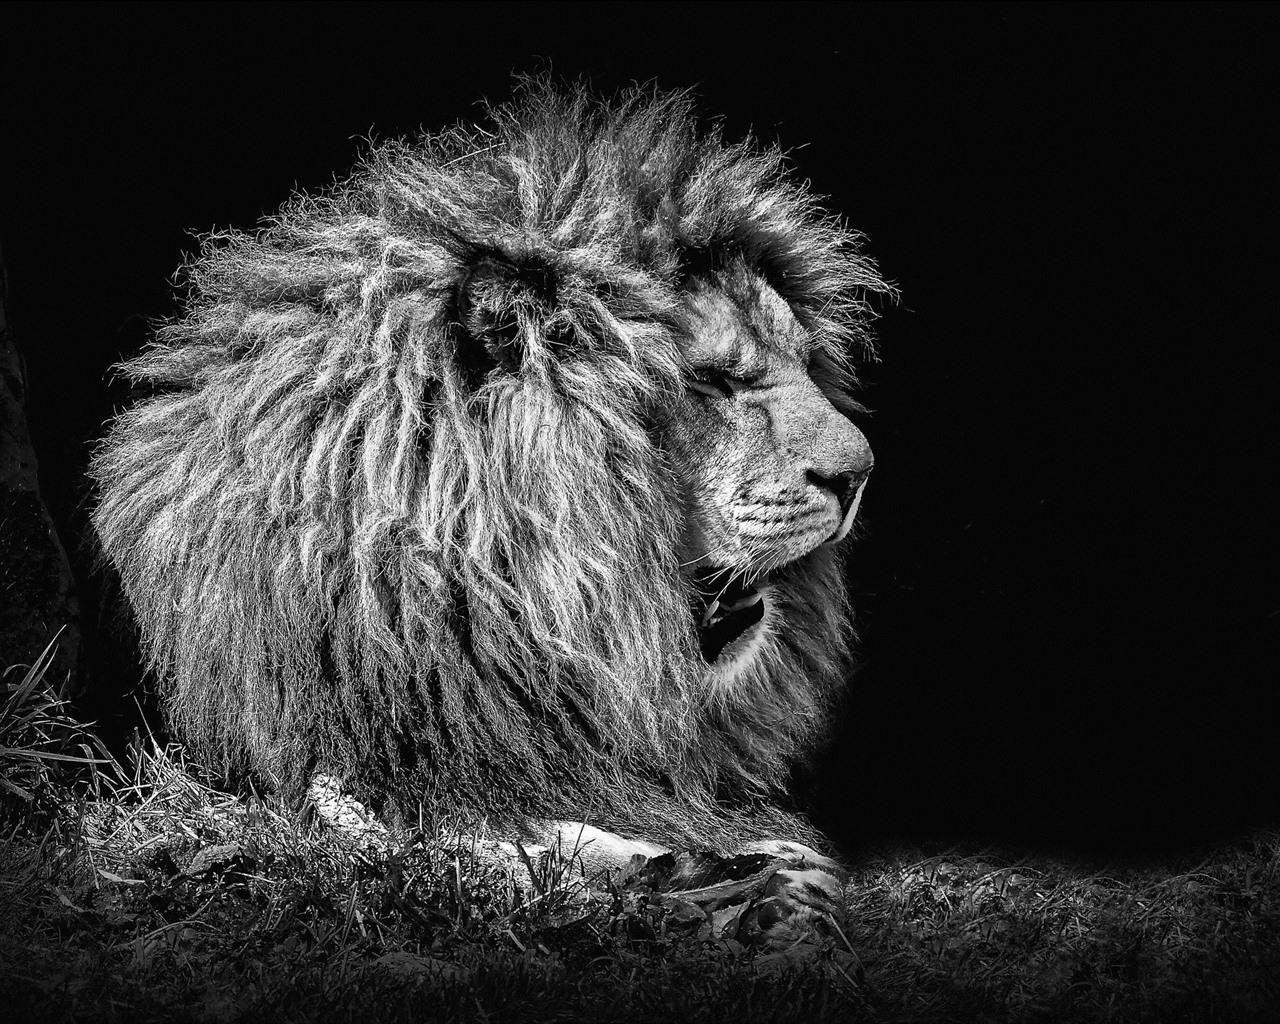 Lion, Black Background 750x1334 IPhone 8/7/6/6S Wallpaper